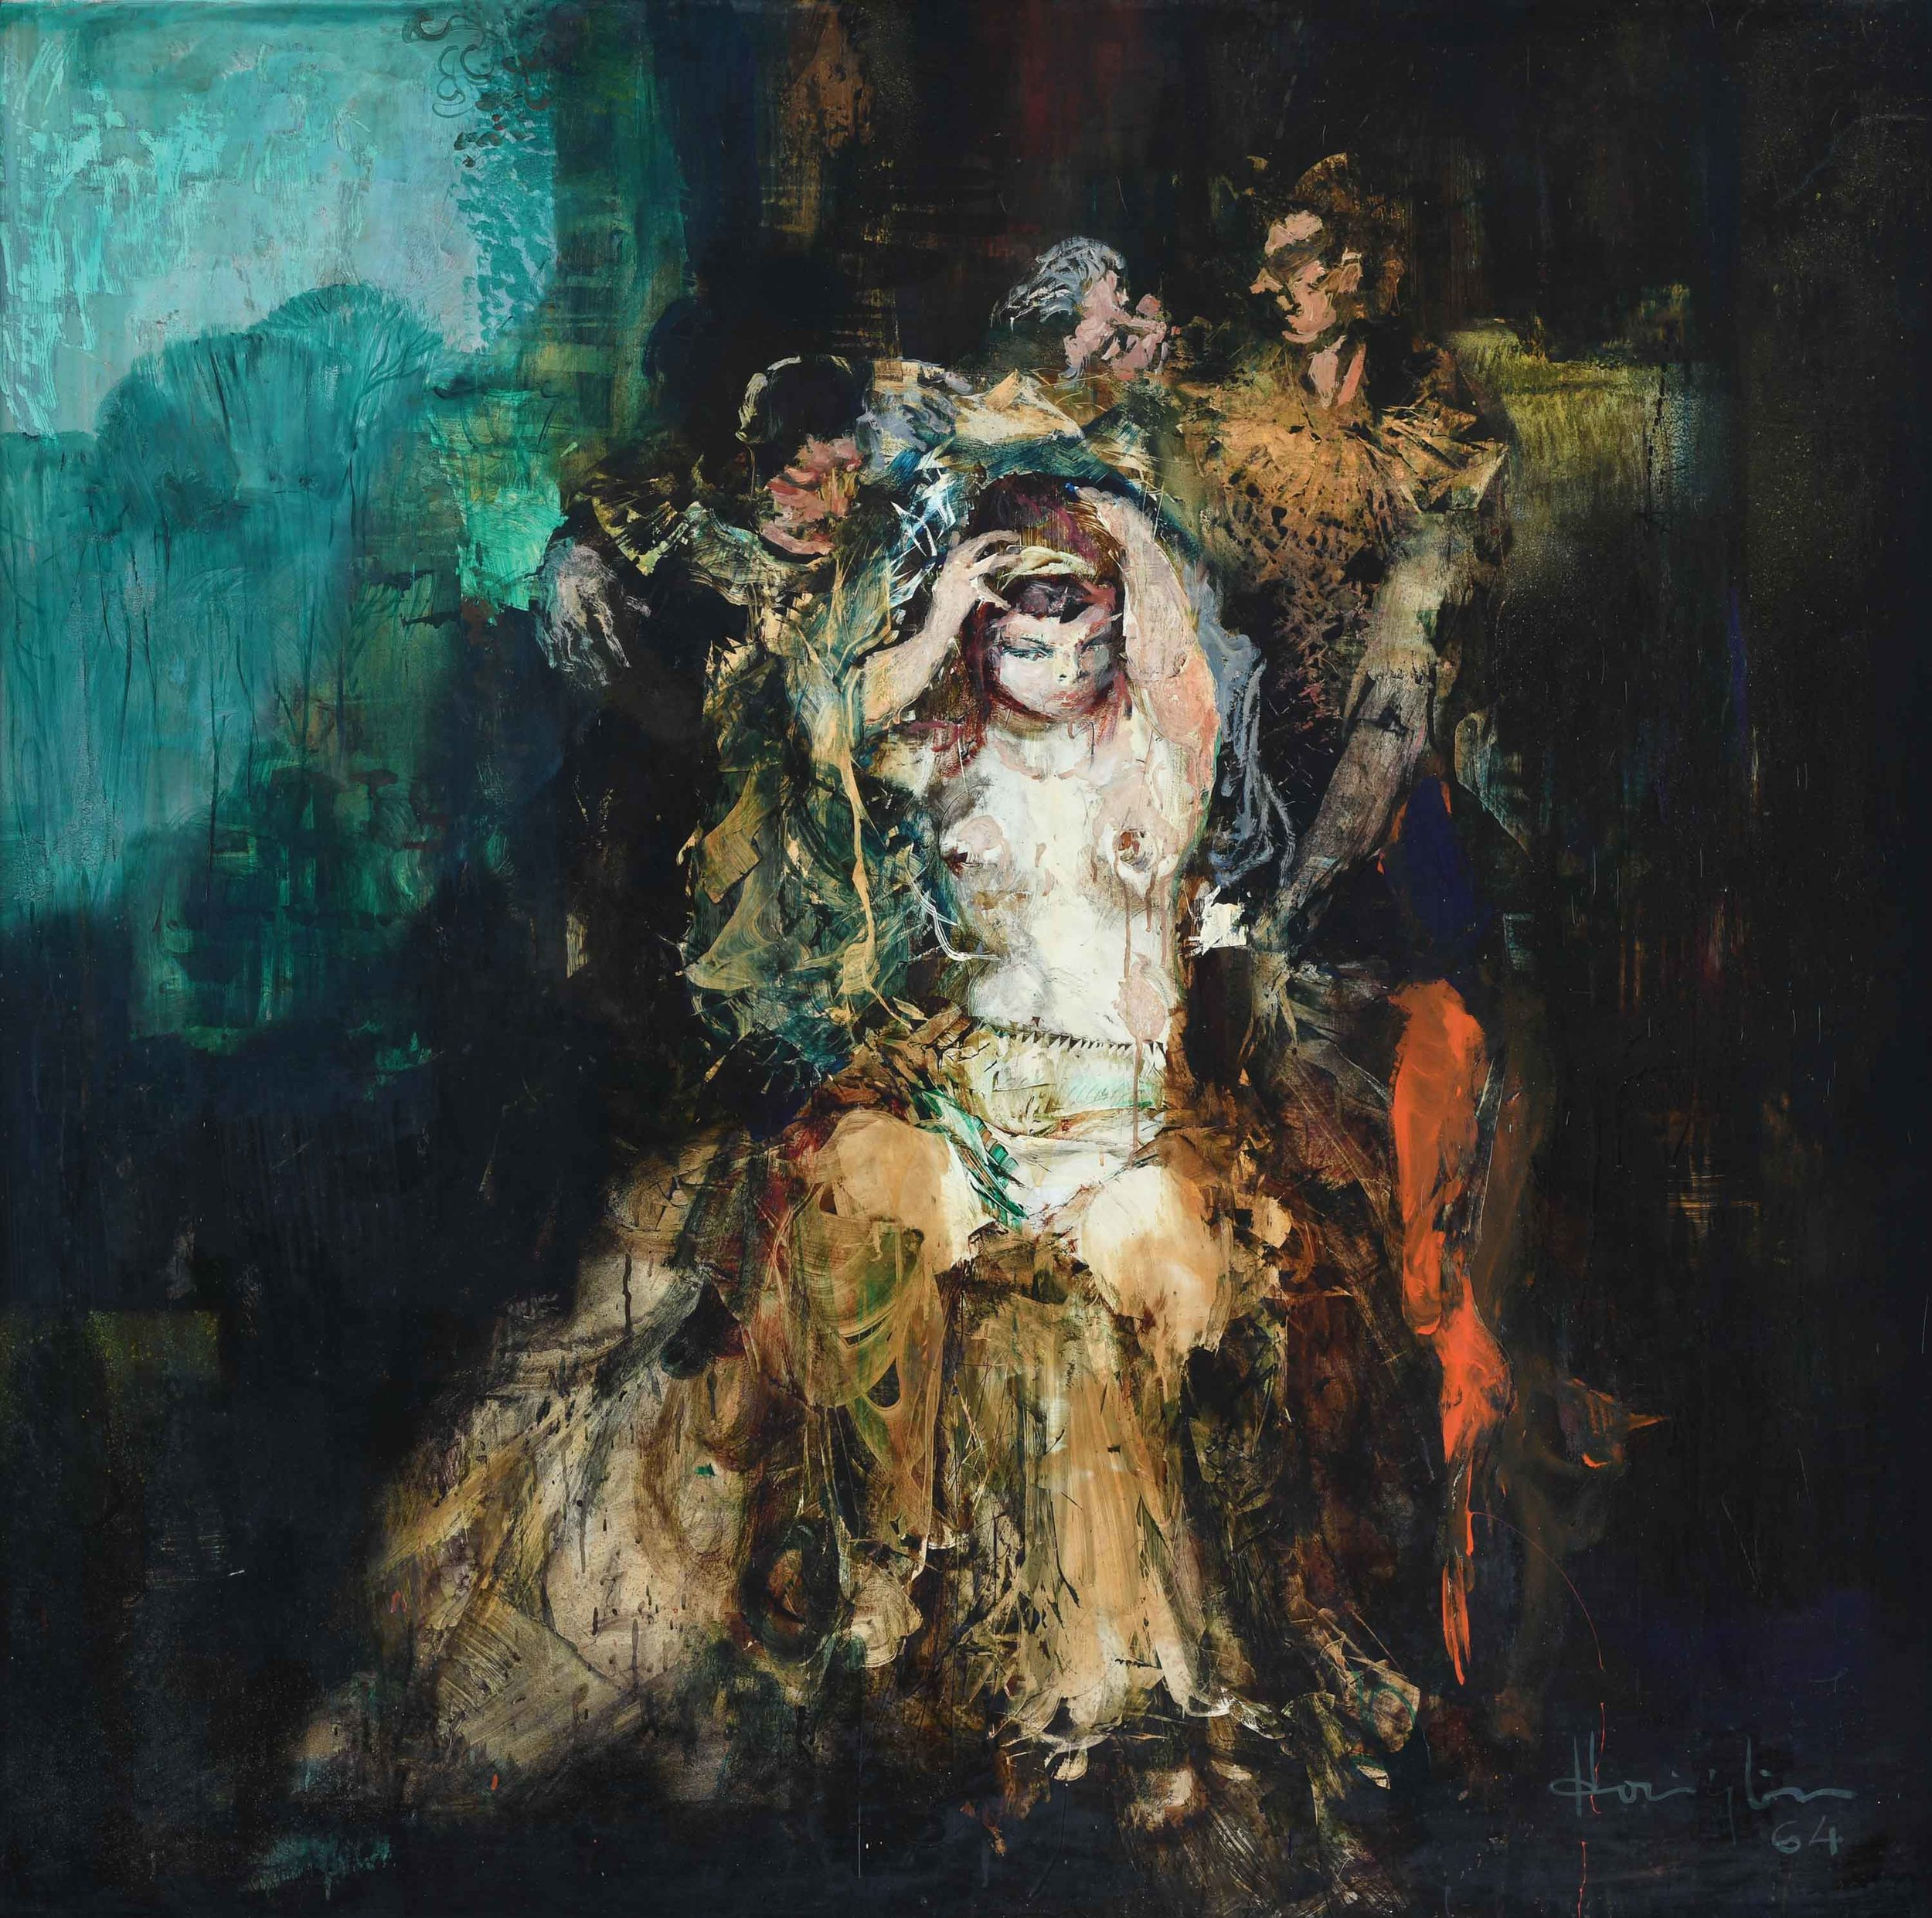 Vincent Hoisington, 'Untitled (A Scene from the Opera)', 1964, oil on board, 150 x 150cm. Image courtesy of Art Agenda, S.E.A.